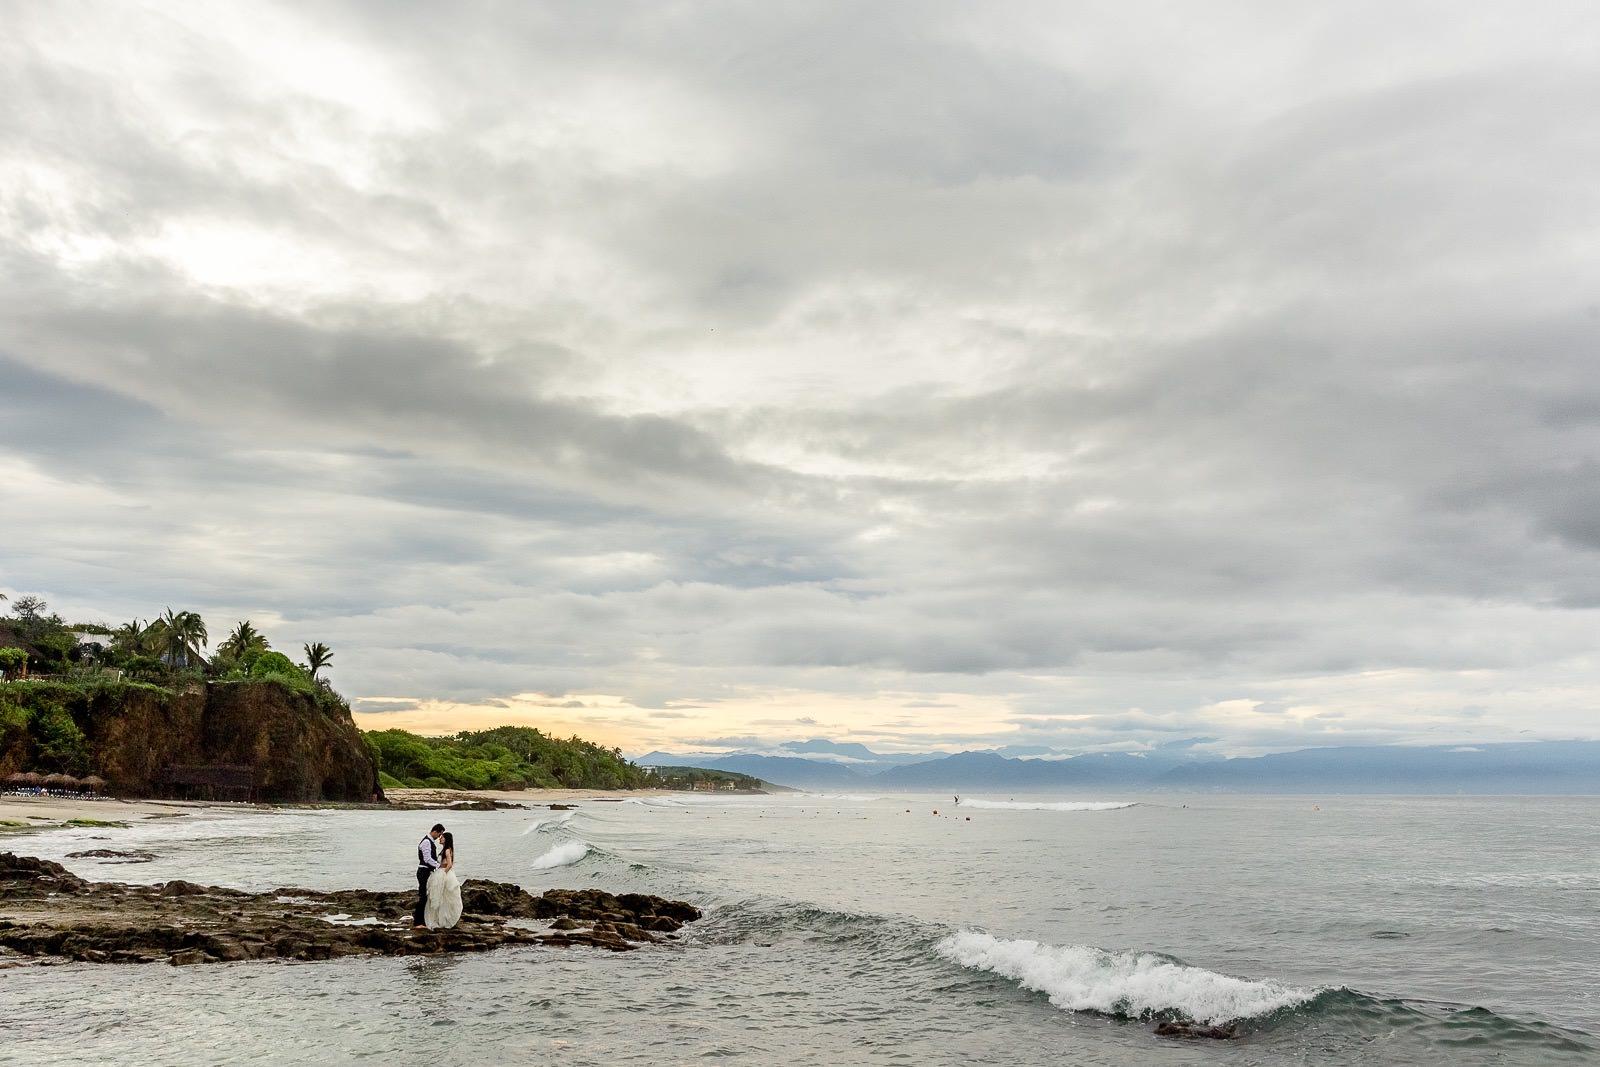 Boda Punta Mita Riviera Nayarit